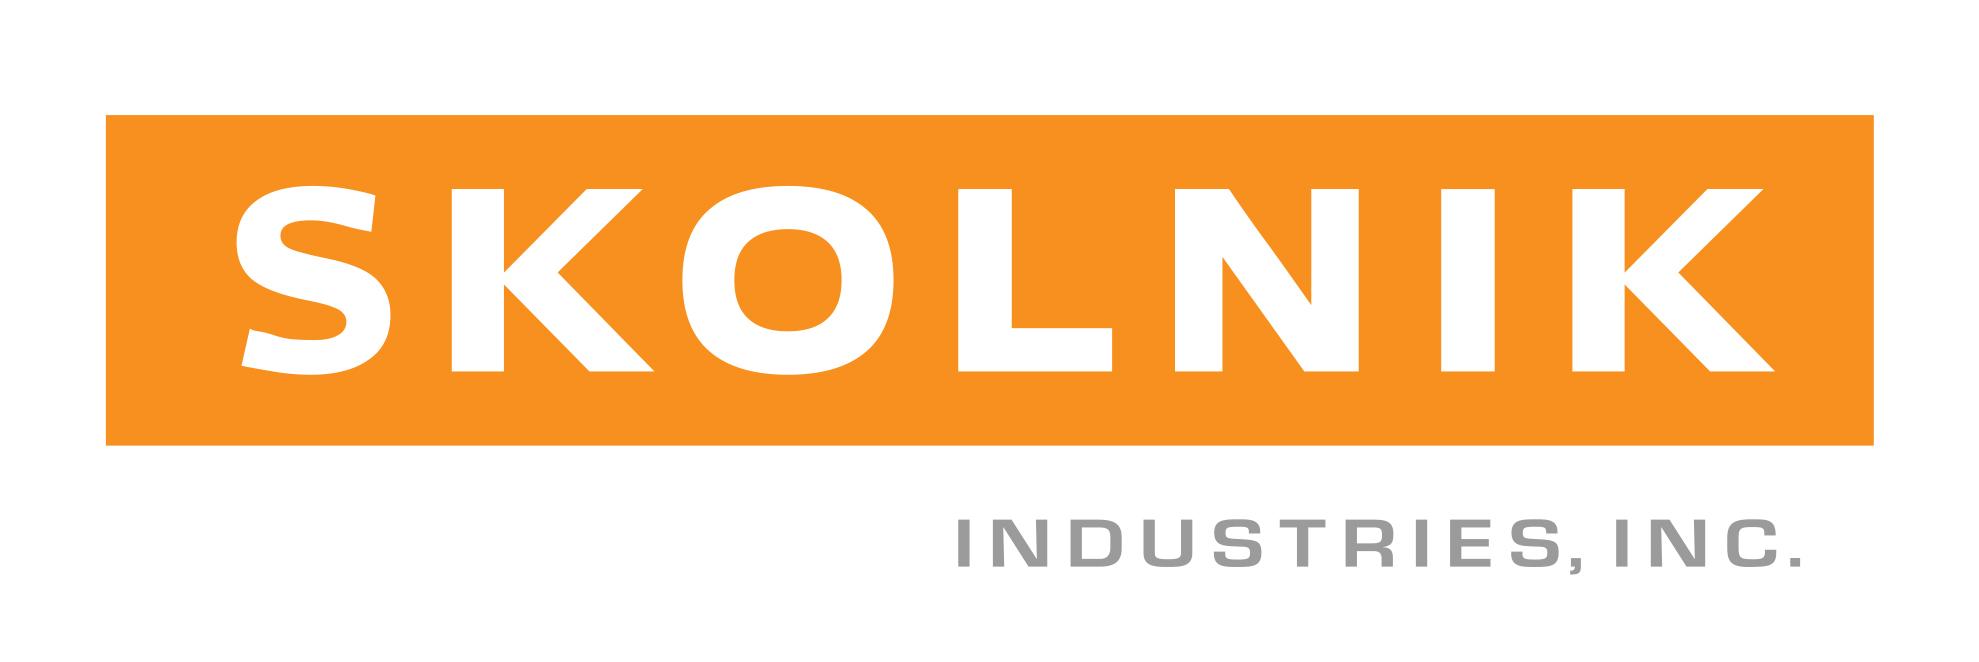 Skolnik Industries